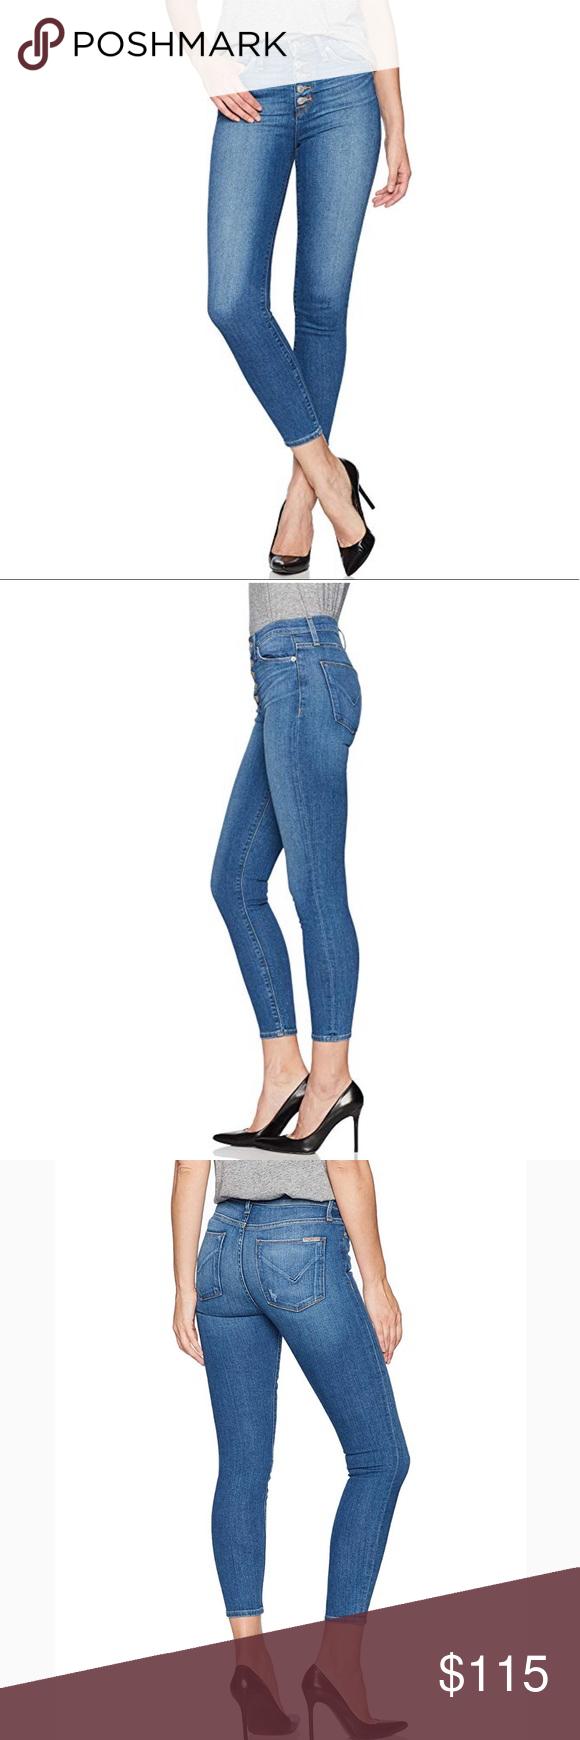 a121a65656e HUDSON Ciara High Rise Exposed Button Skinny Jeans NWT Hudson Ciara High  Waisted Super Skinny Exposed